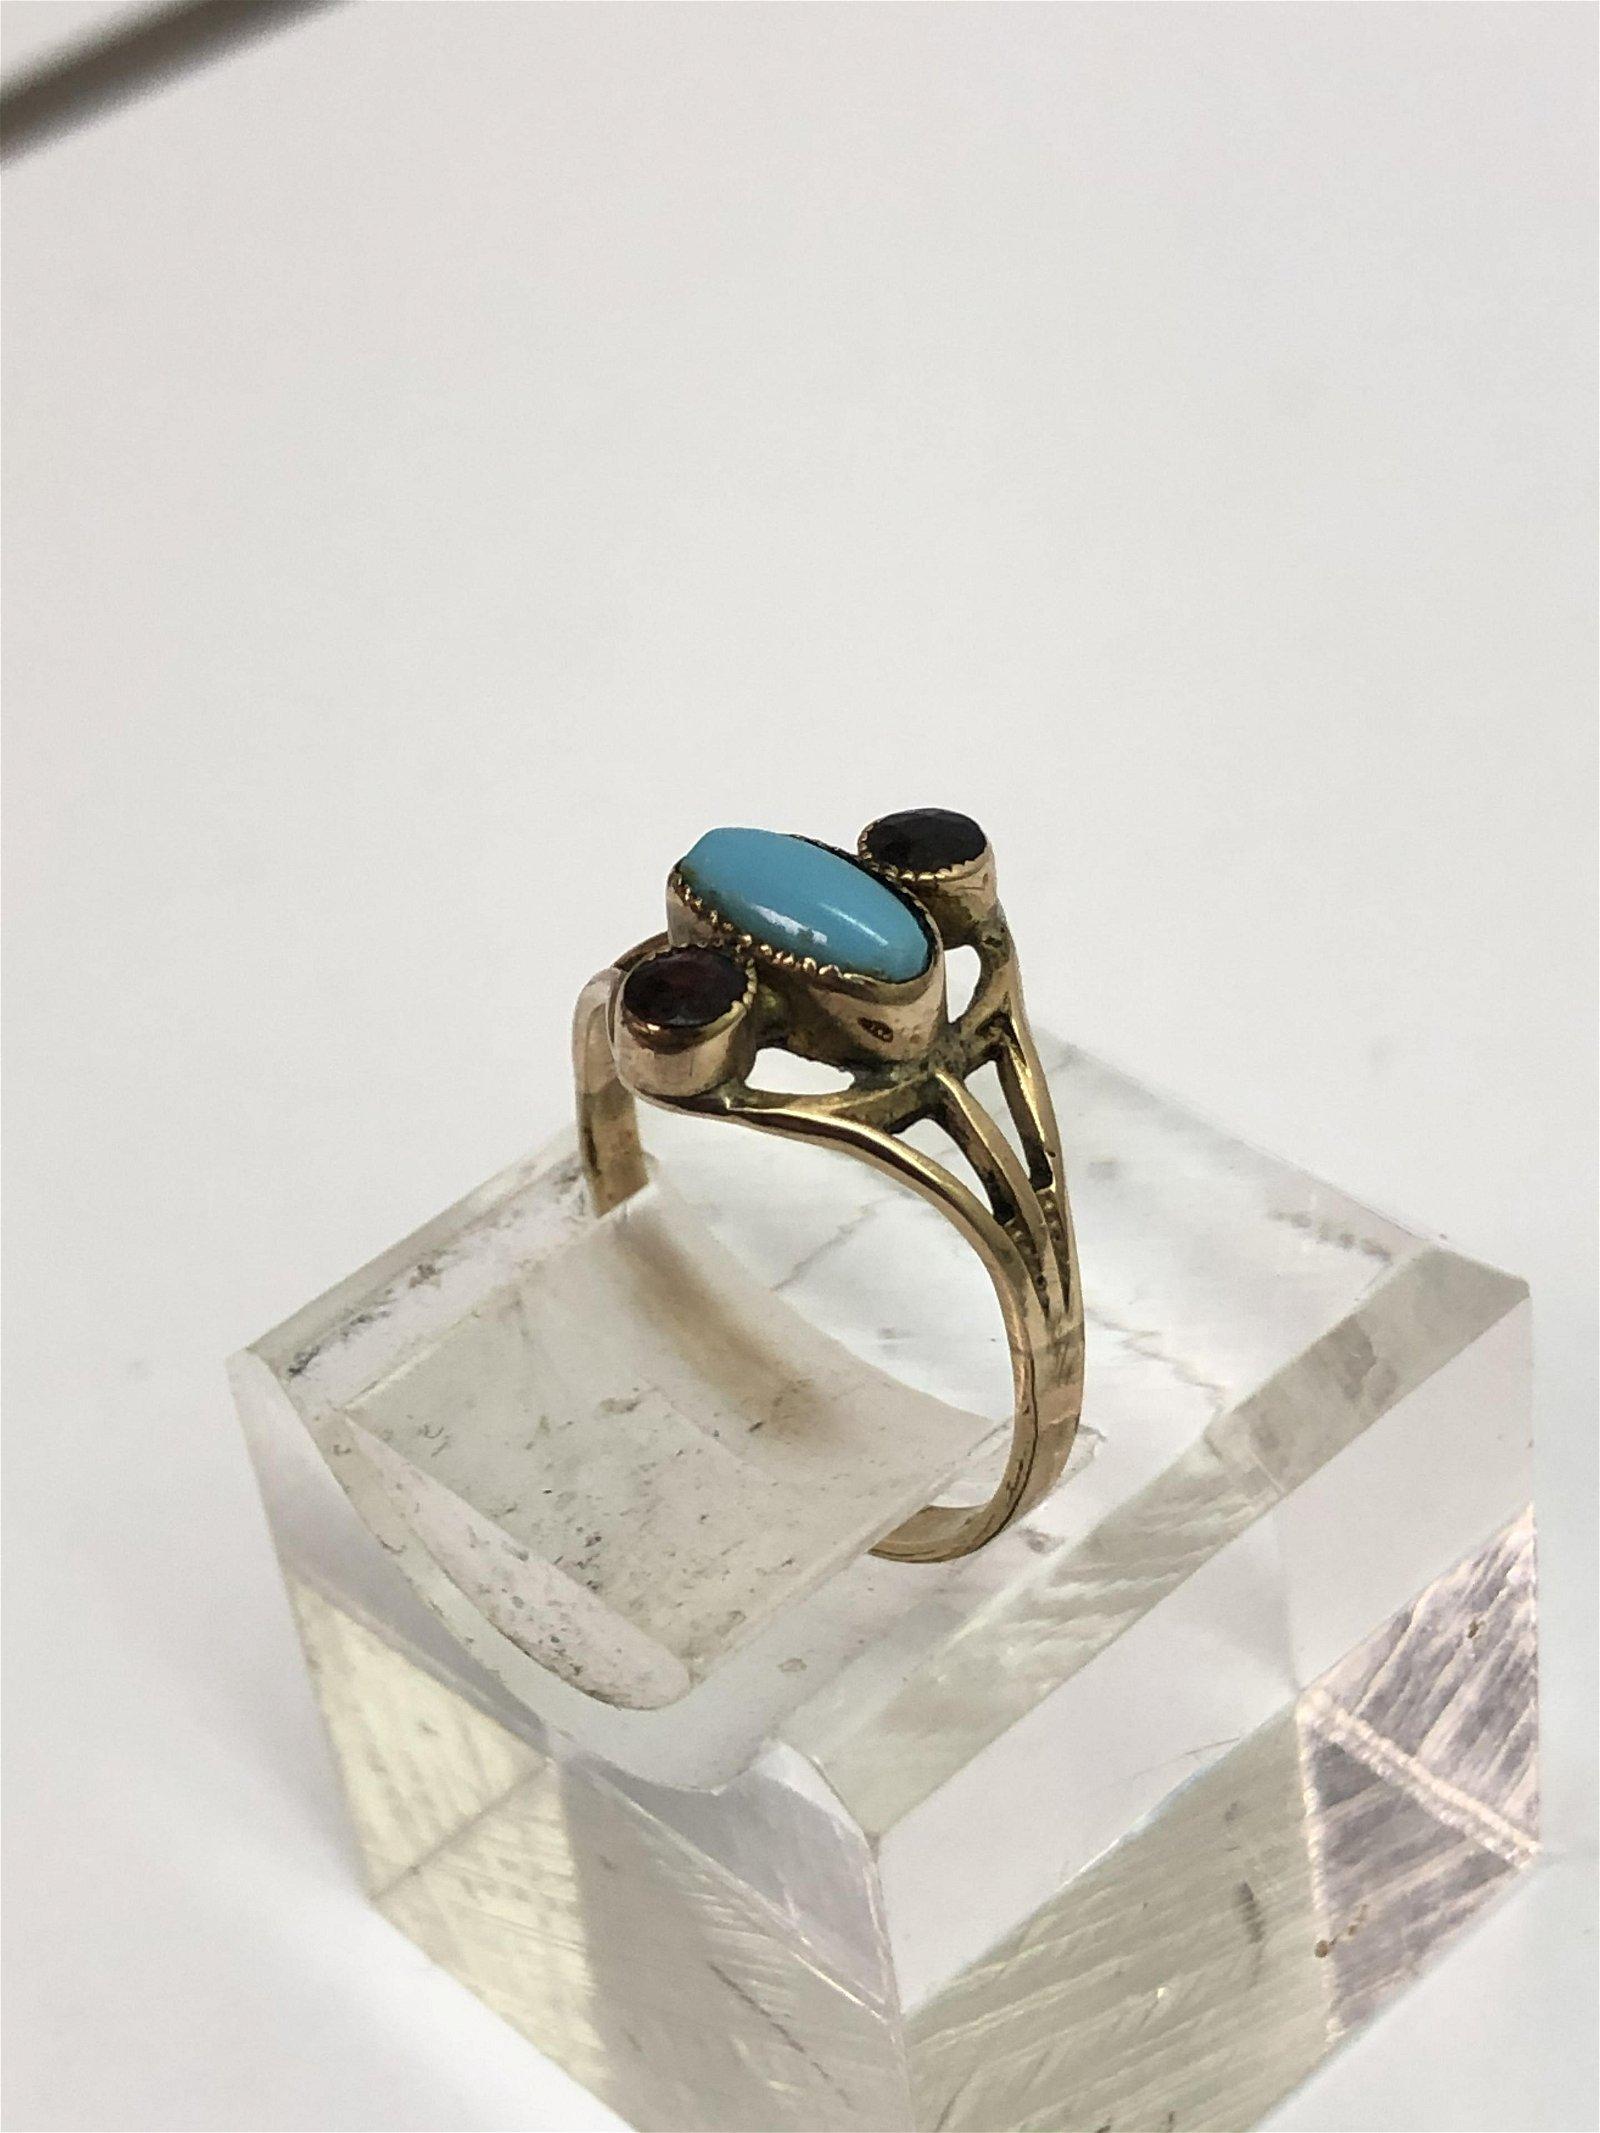 14K Gold Arts Crafts Turquoise Garnet Ring